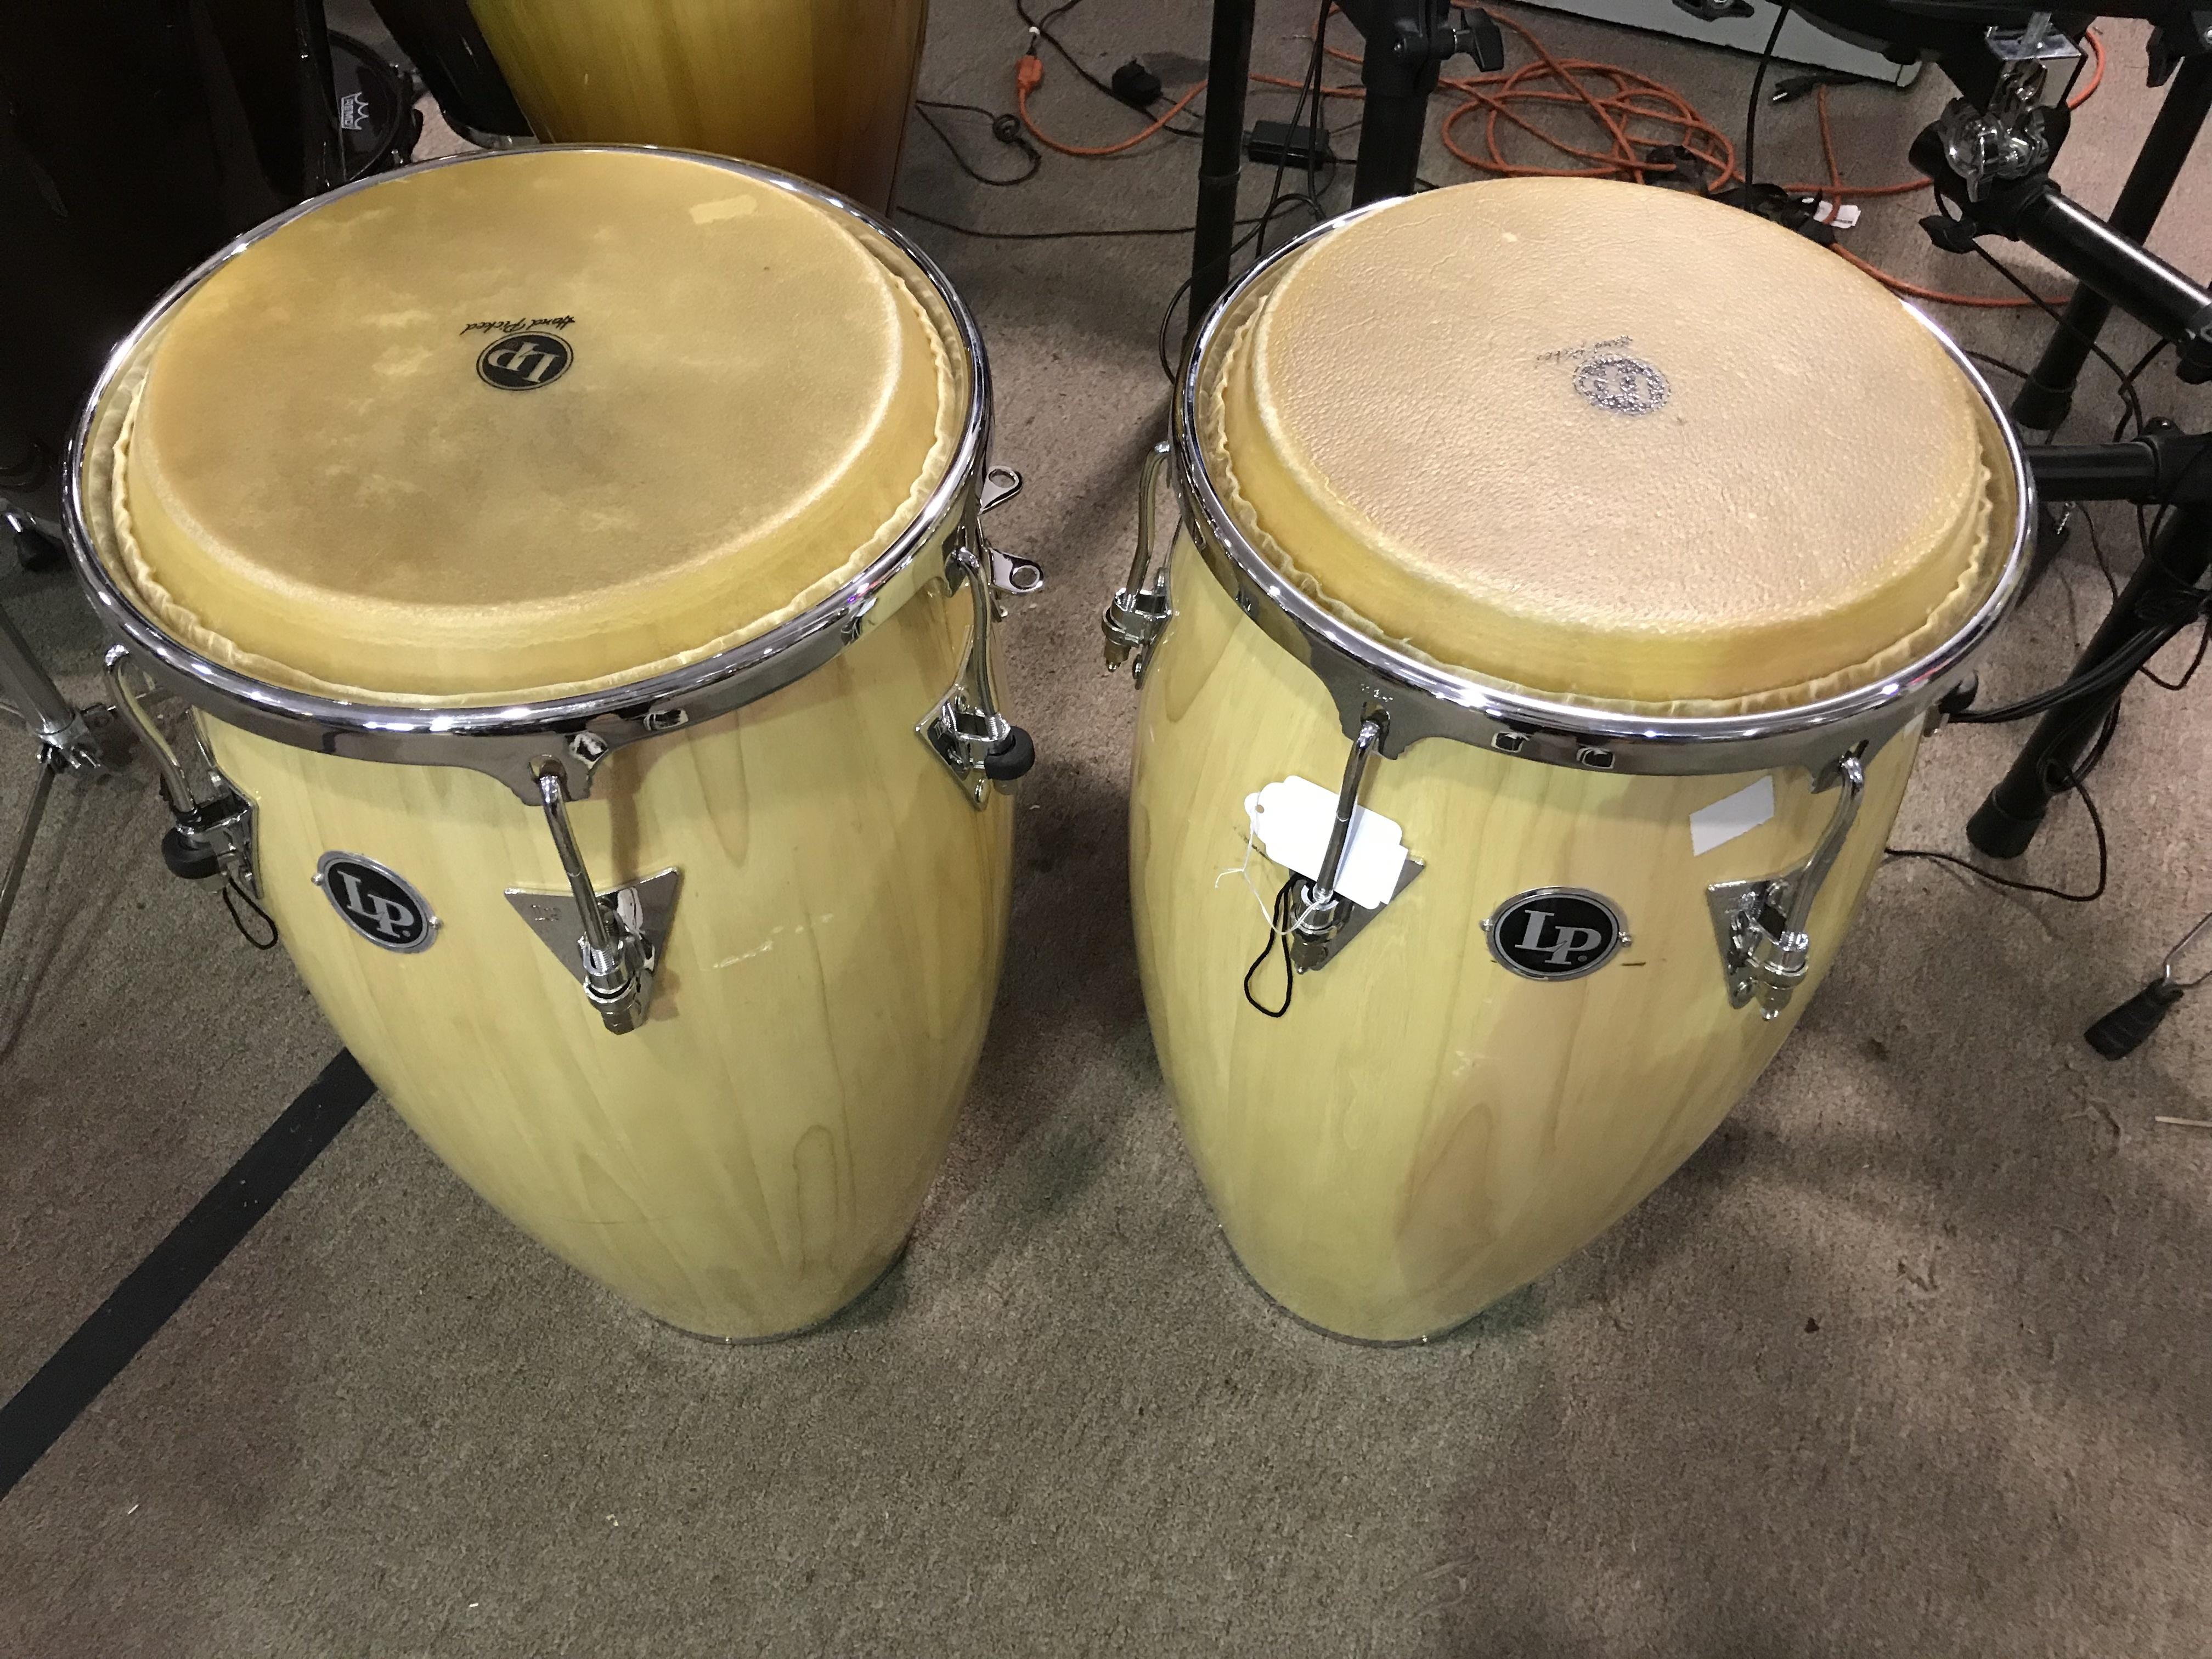 L.P. Classic II Conga Drums Pair